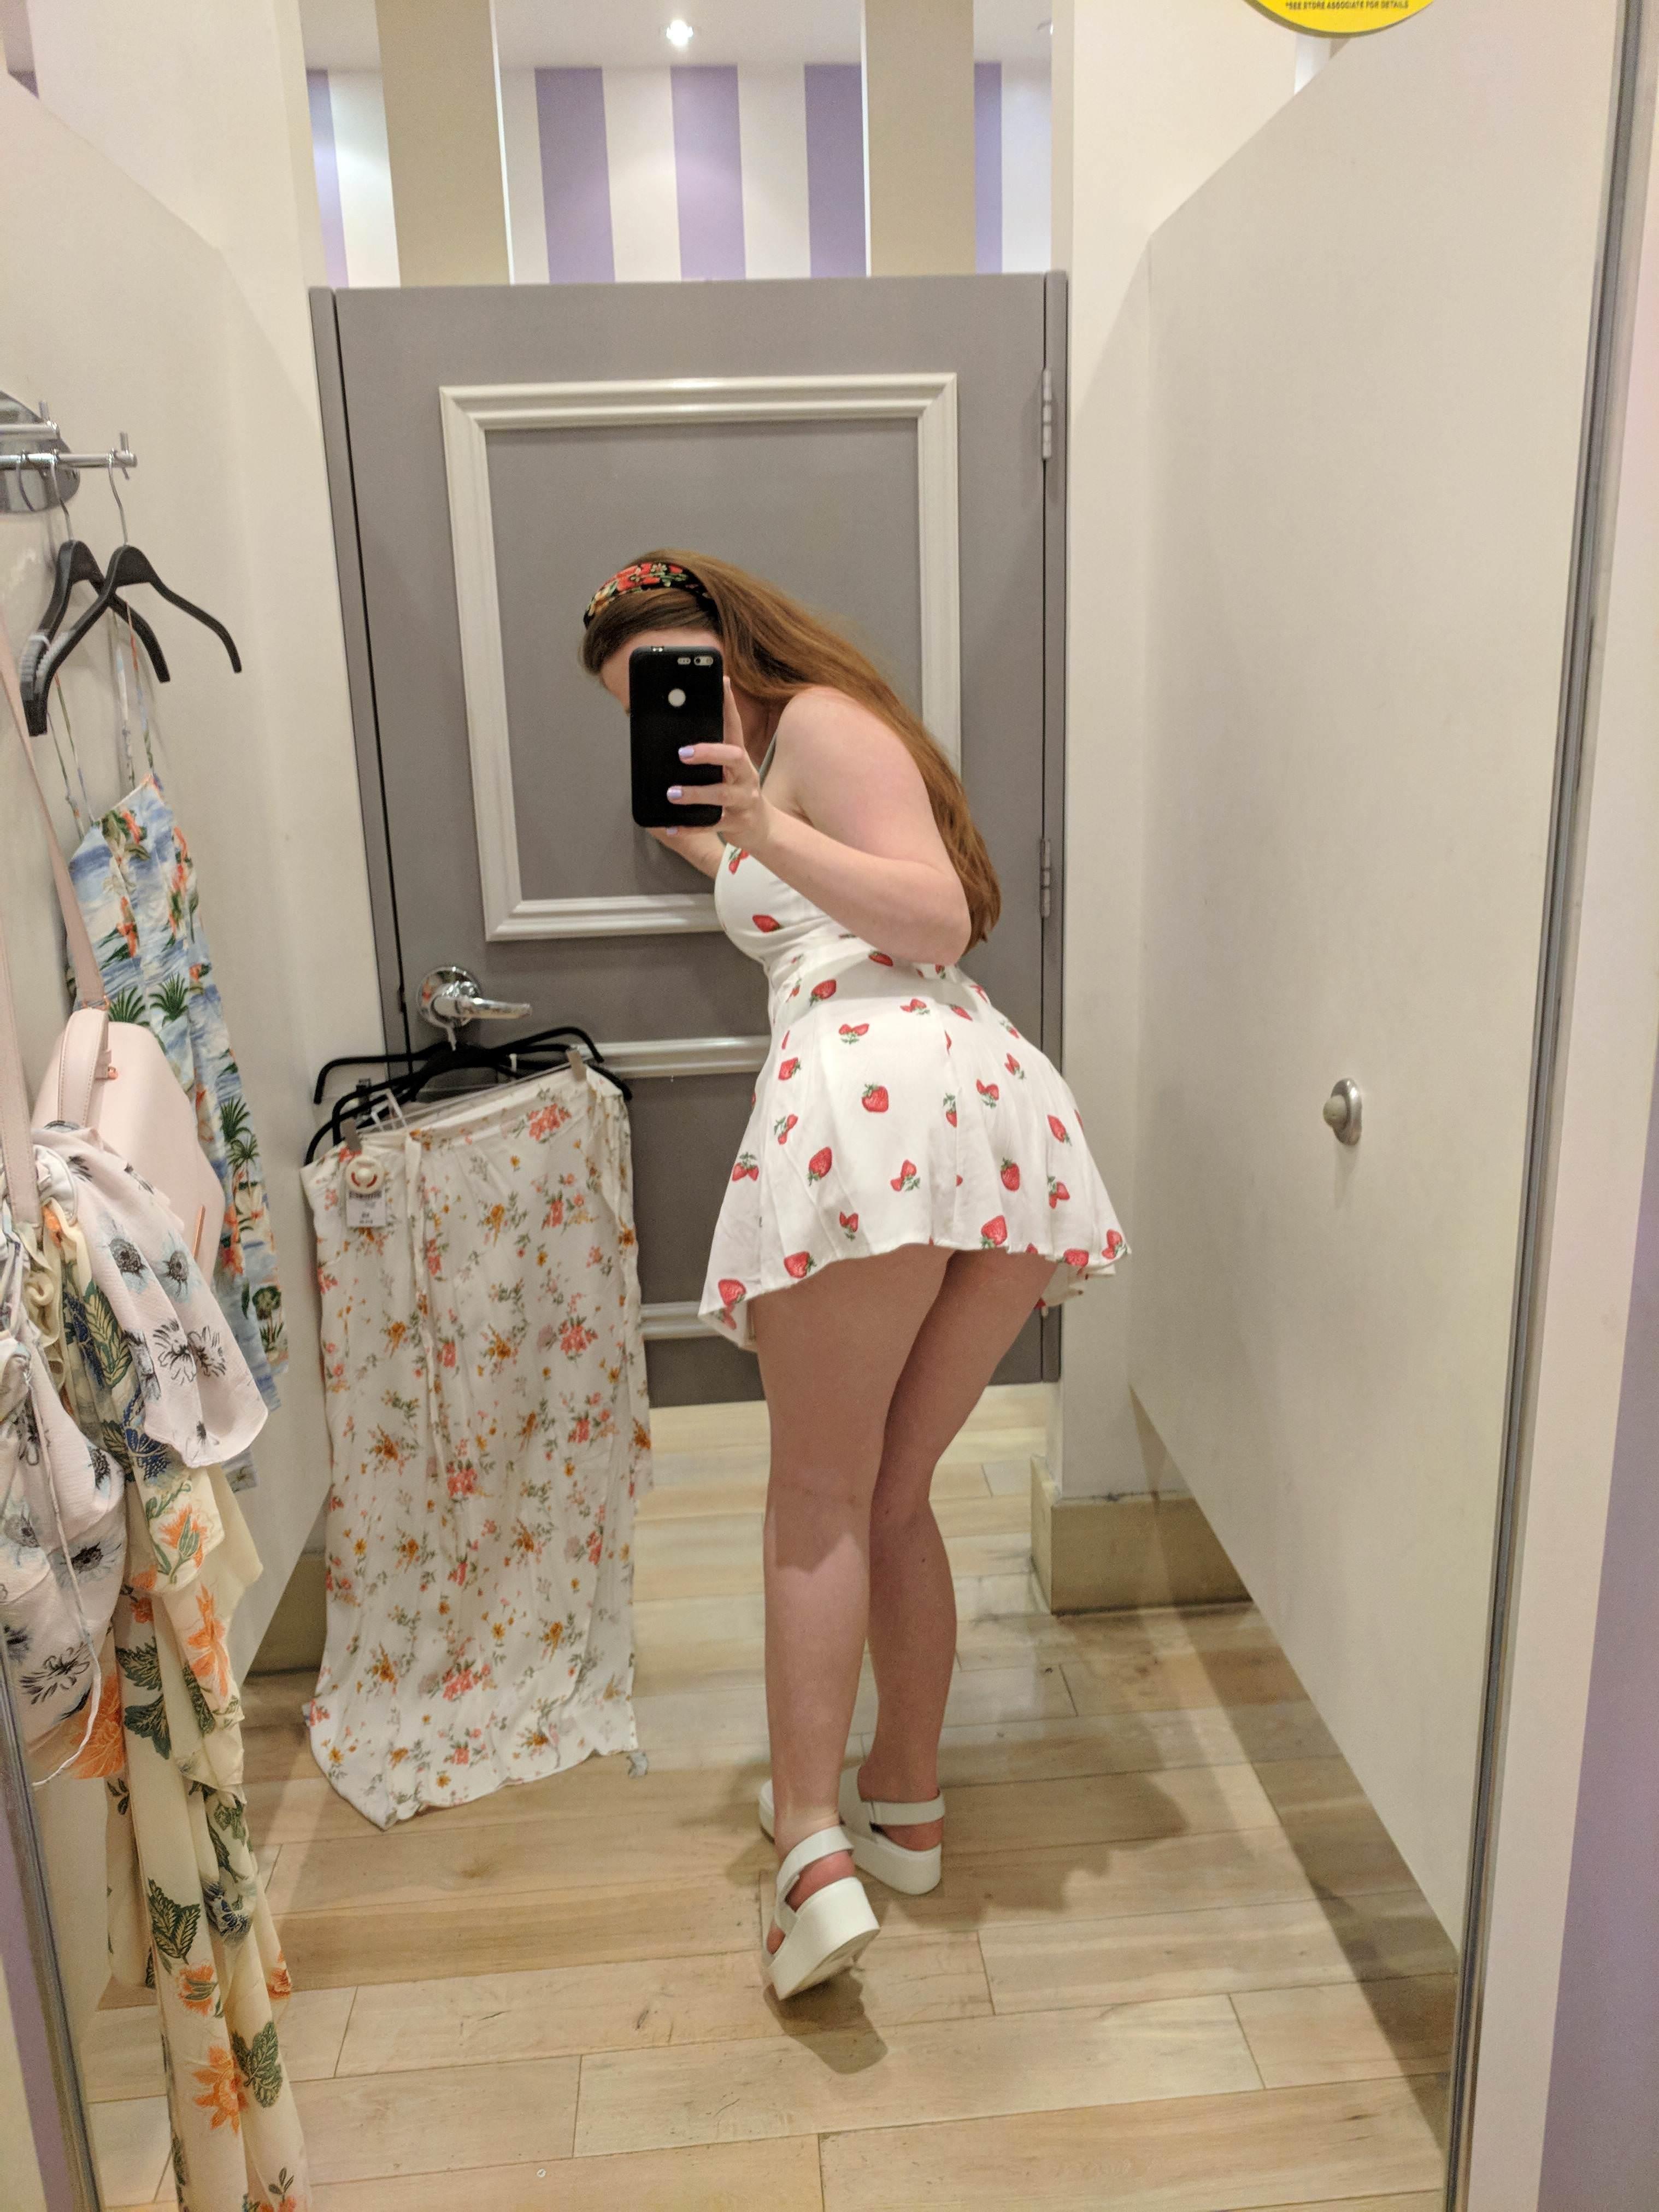 Do You Want A Peek Up My Skirt Porn Photo